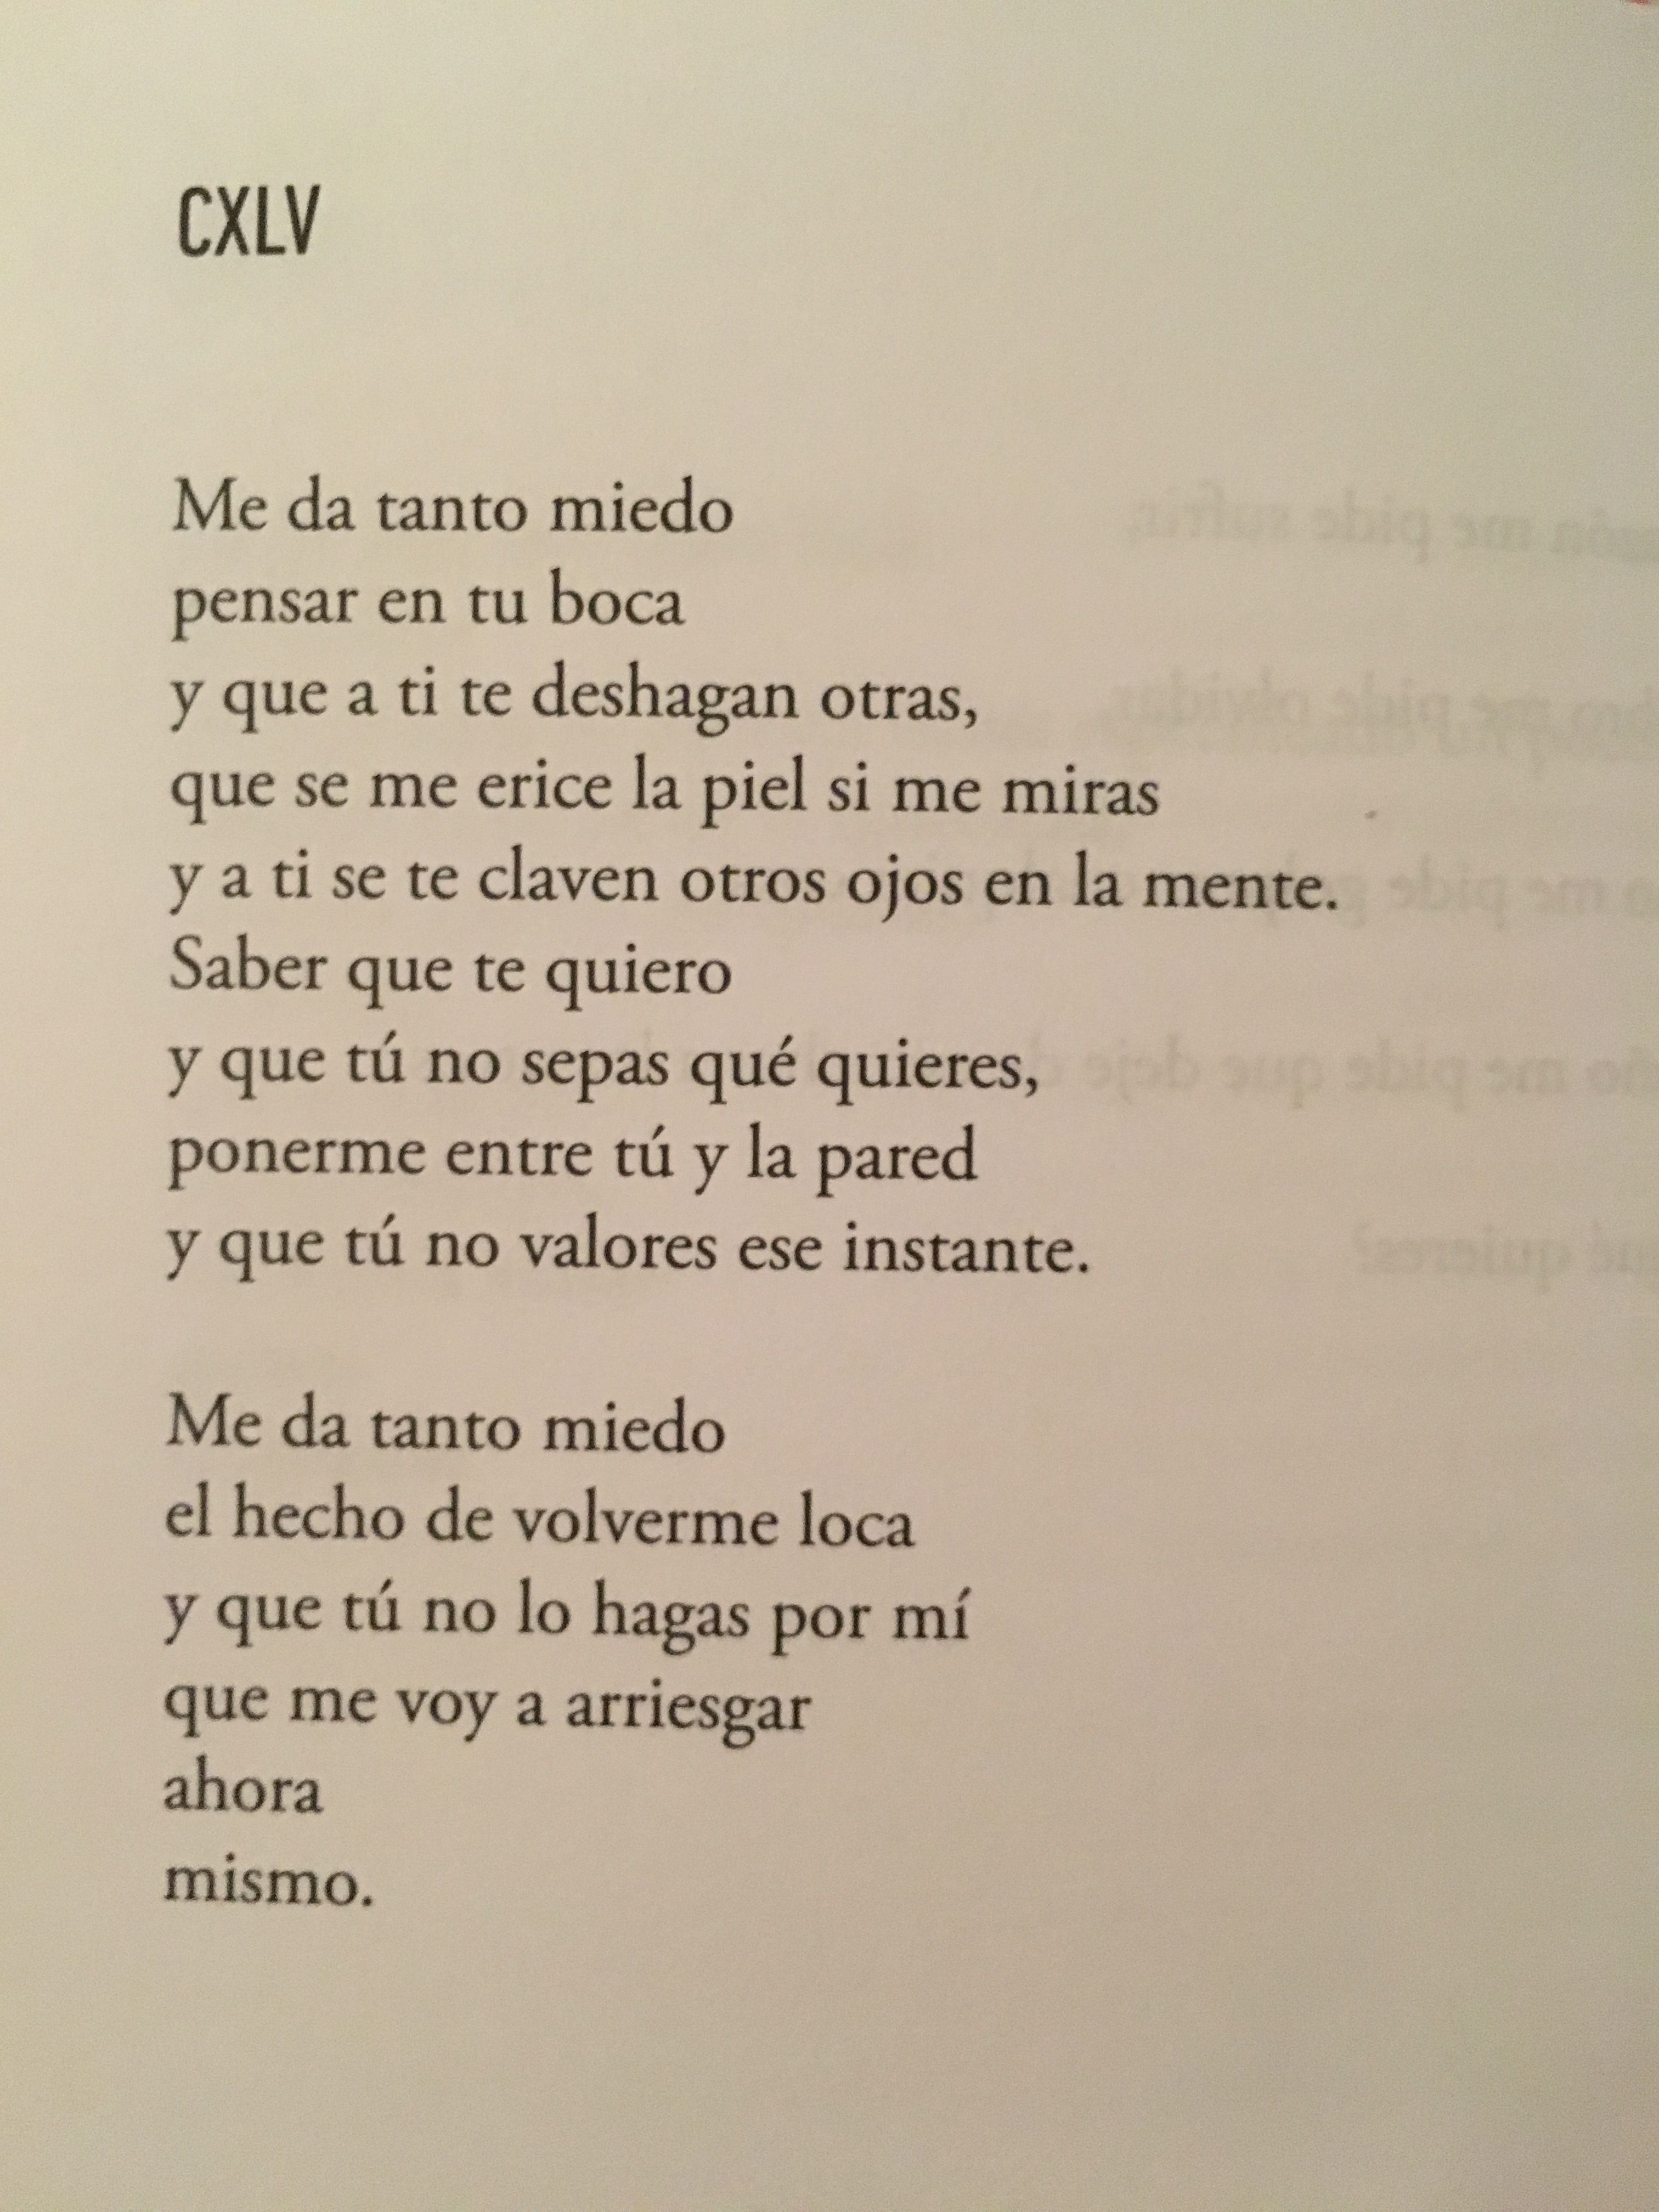 Amor Y Asco Srtabebi Poesia Coincidencias Pinterest Poem